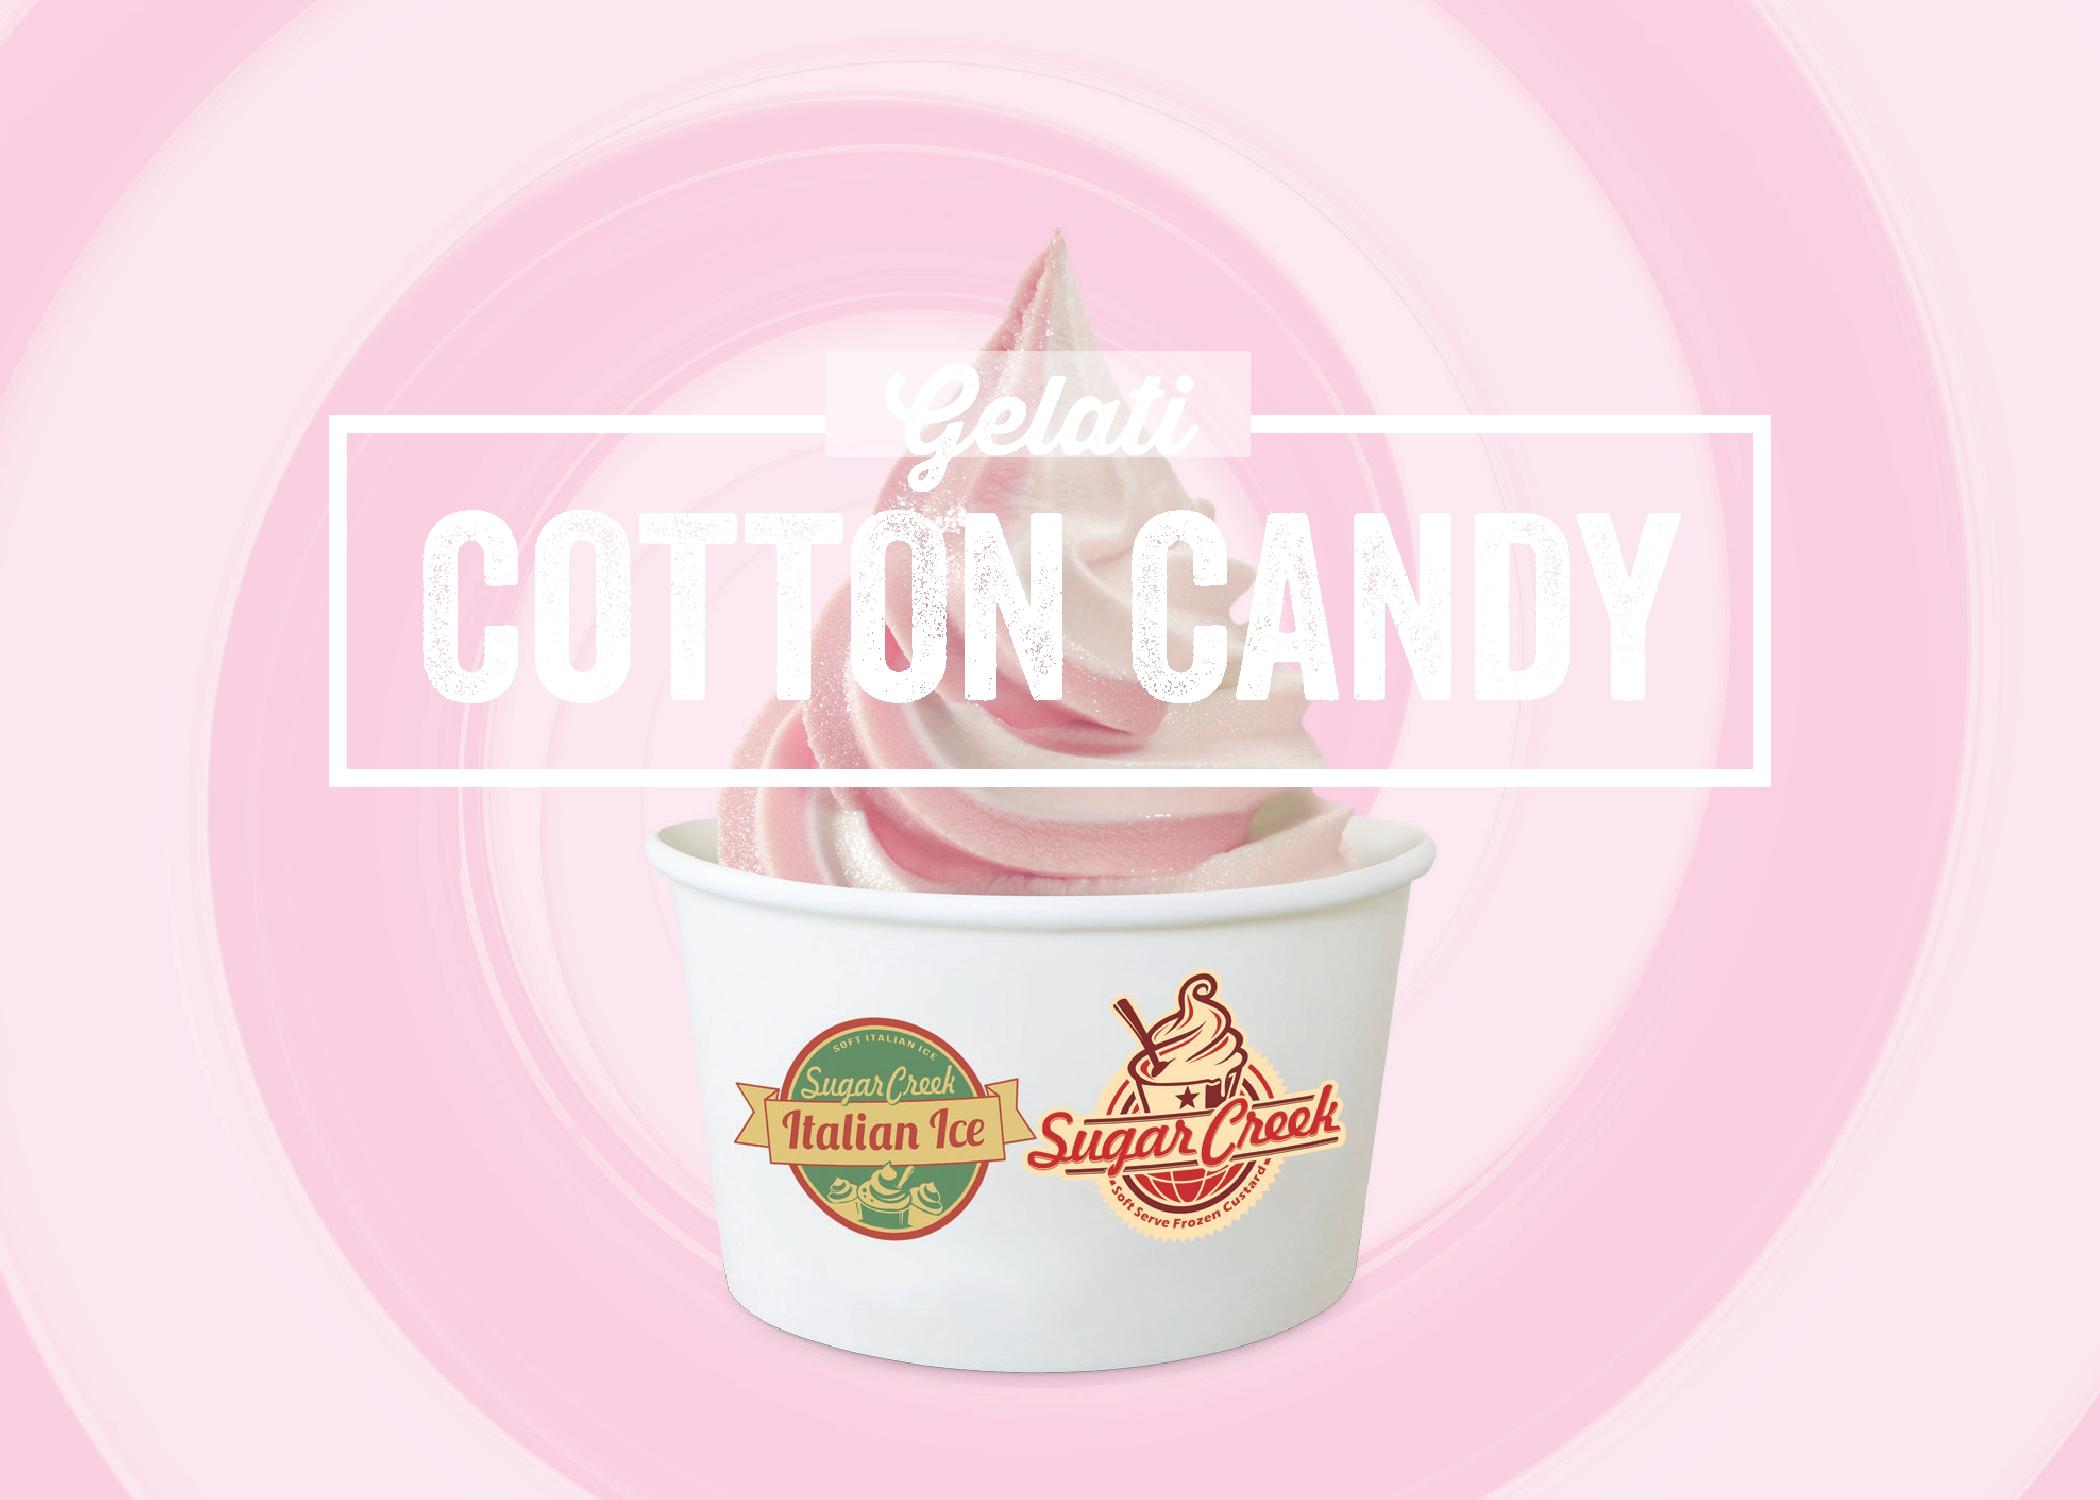 Cotton Candy Gelati